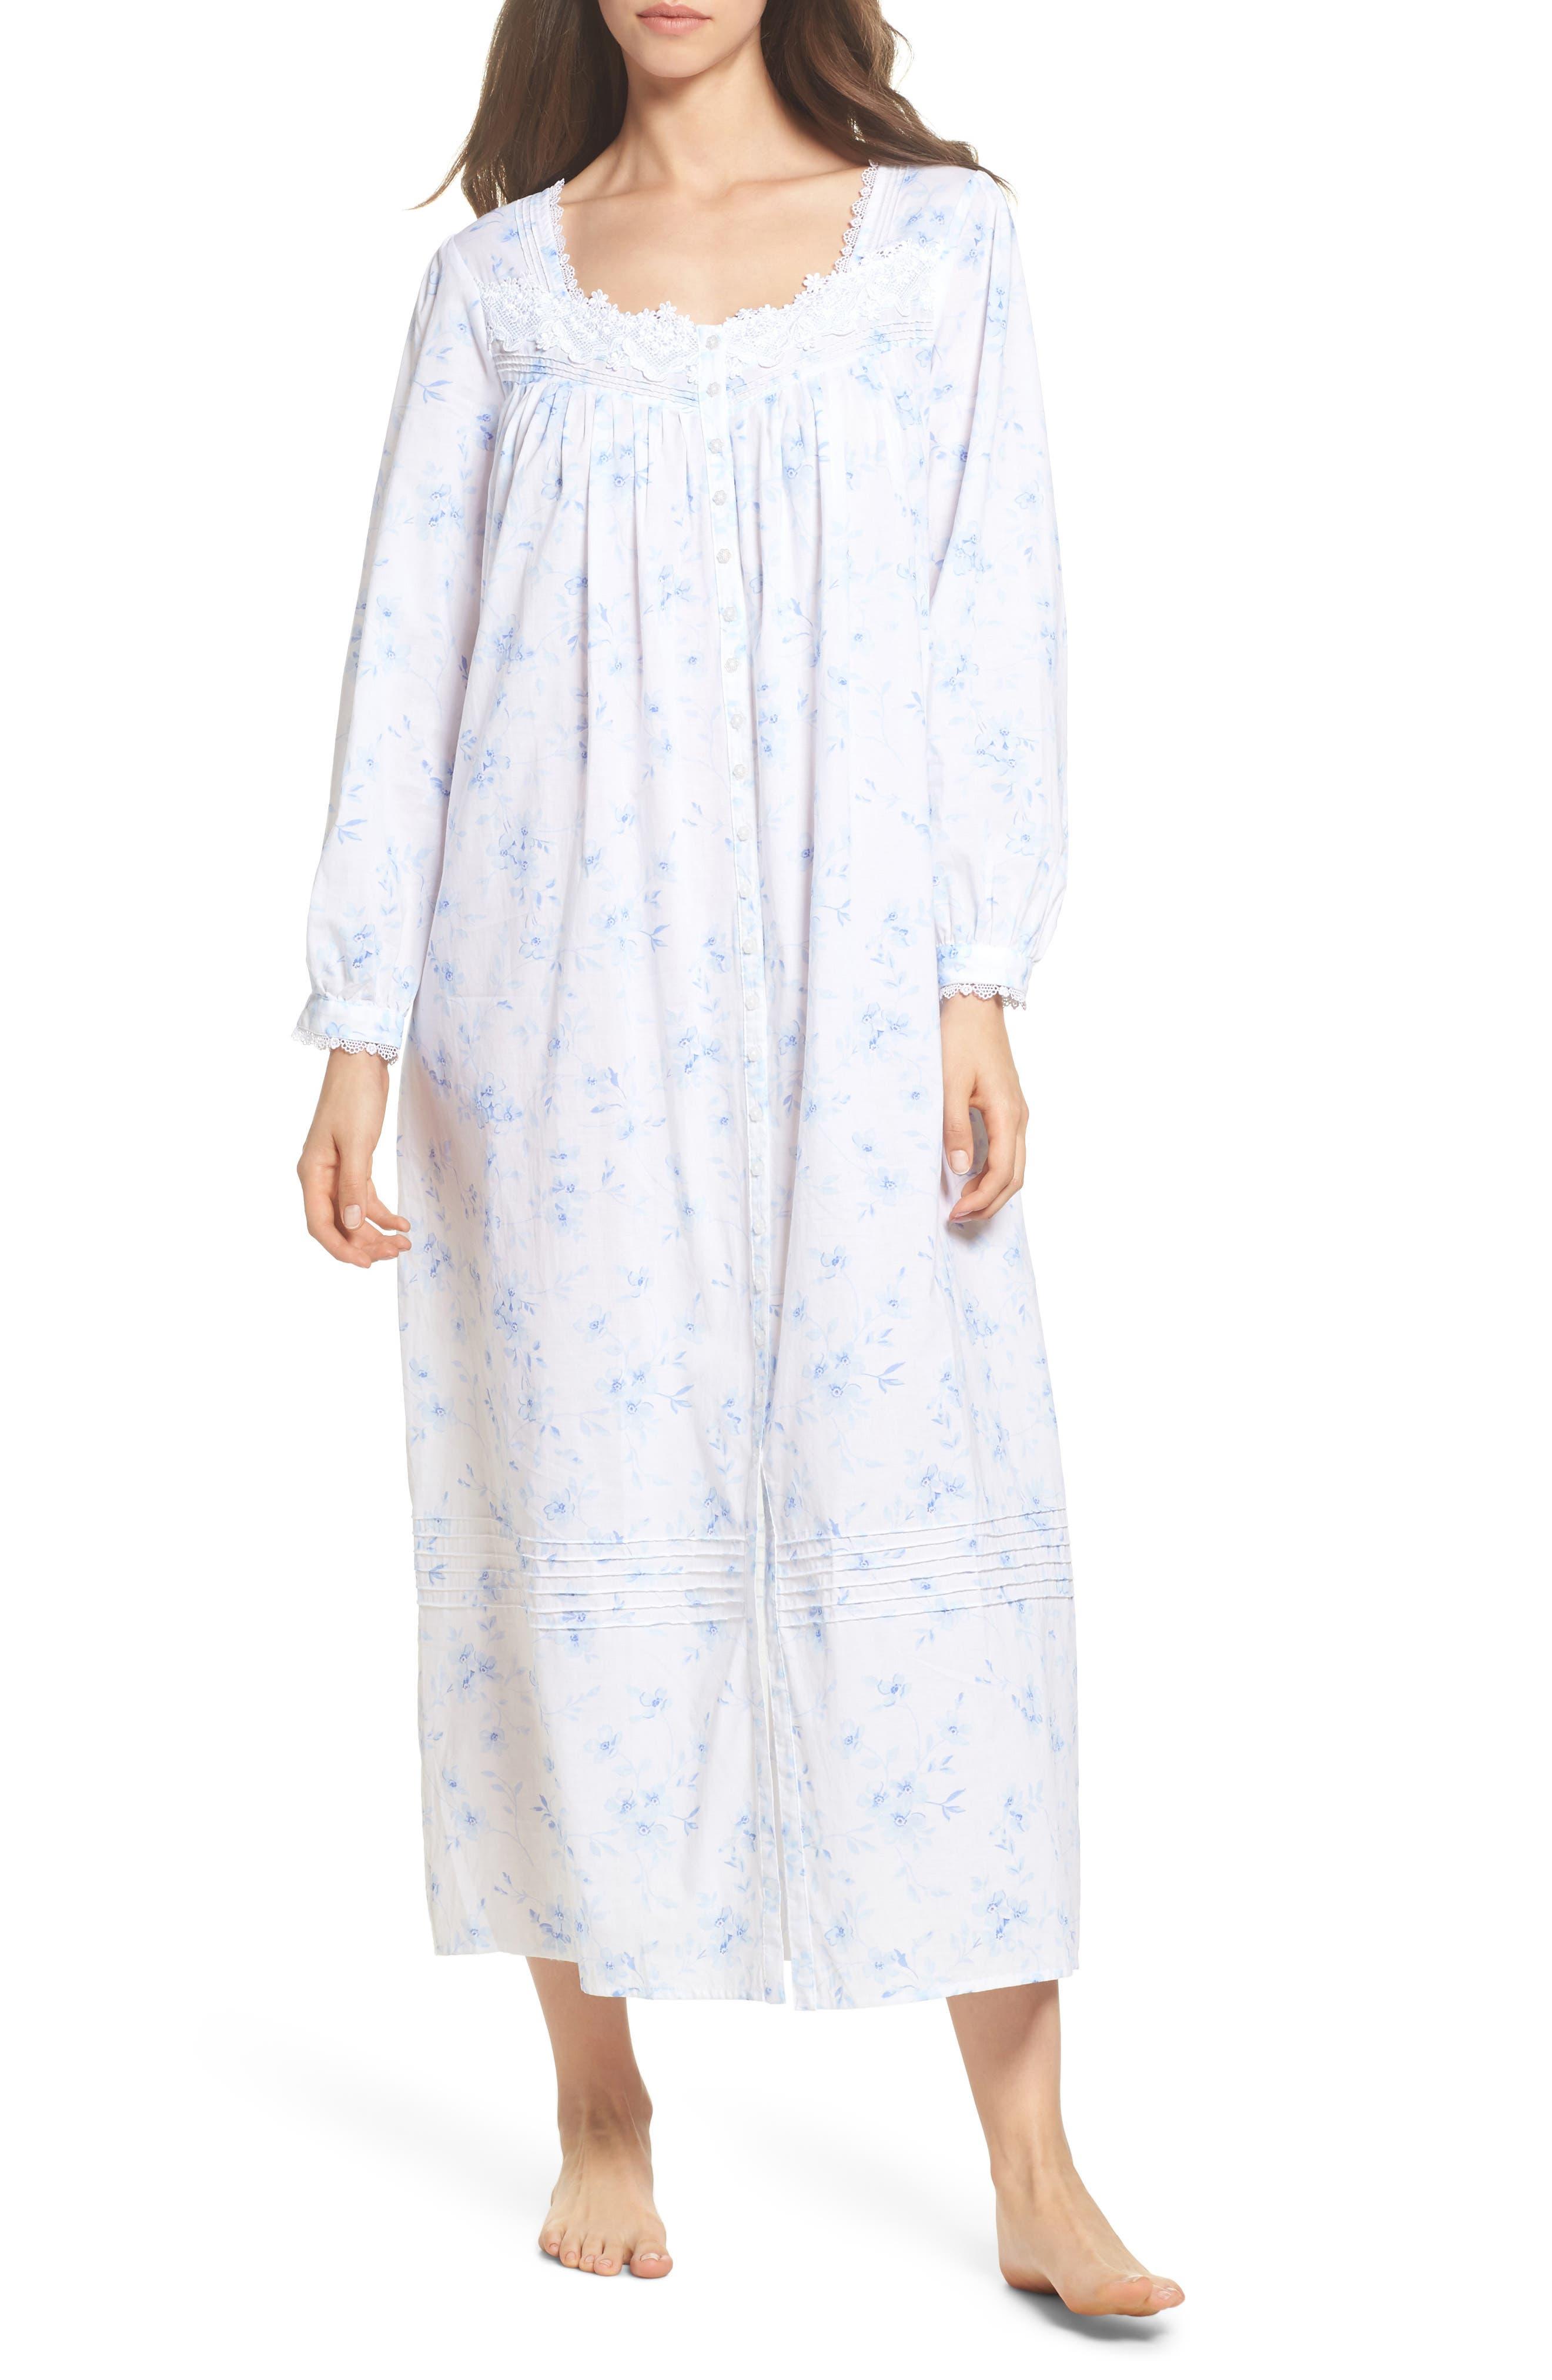 Cotton Lawn Ballet Nightgown,                         Main,                         color, White Mono Floral